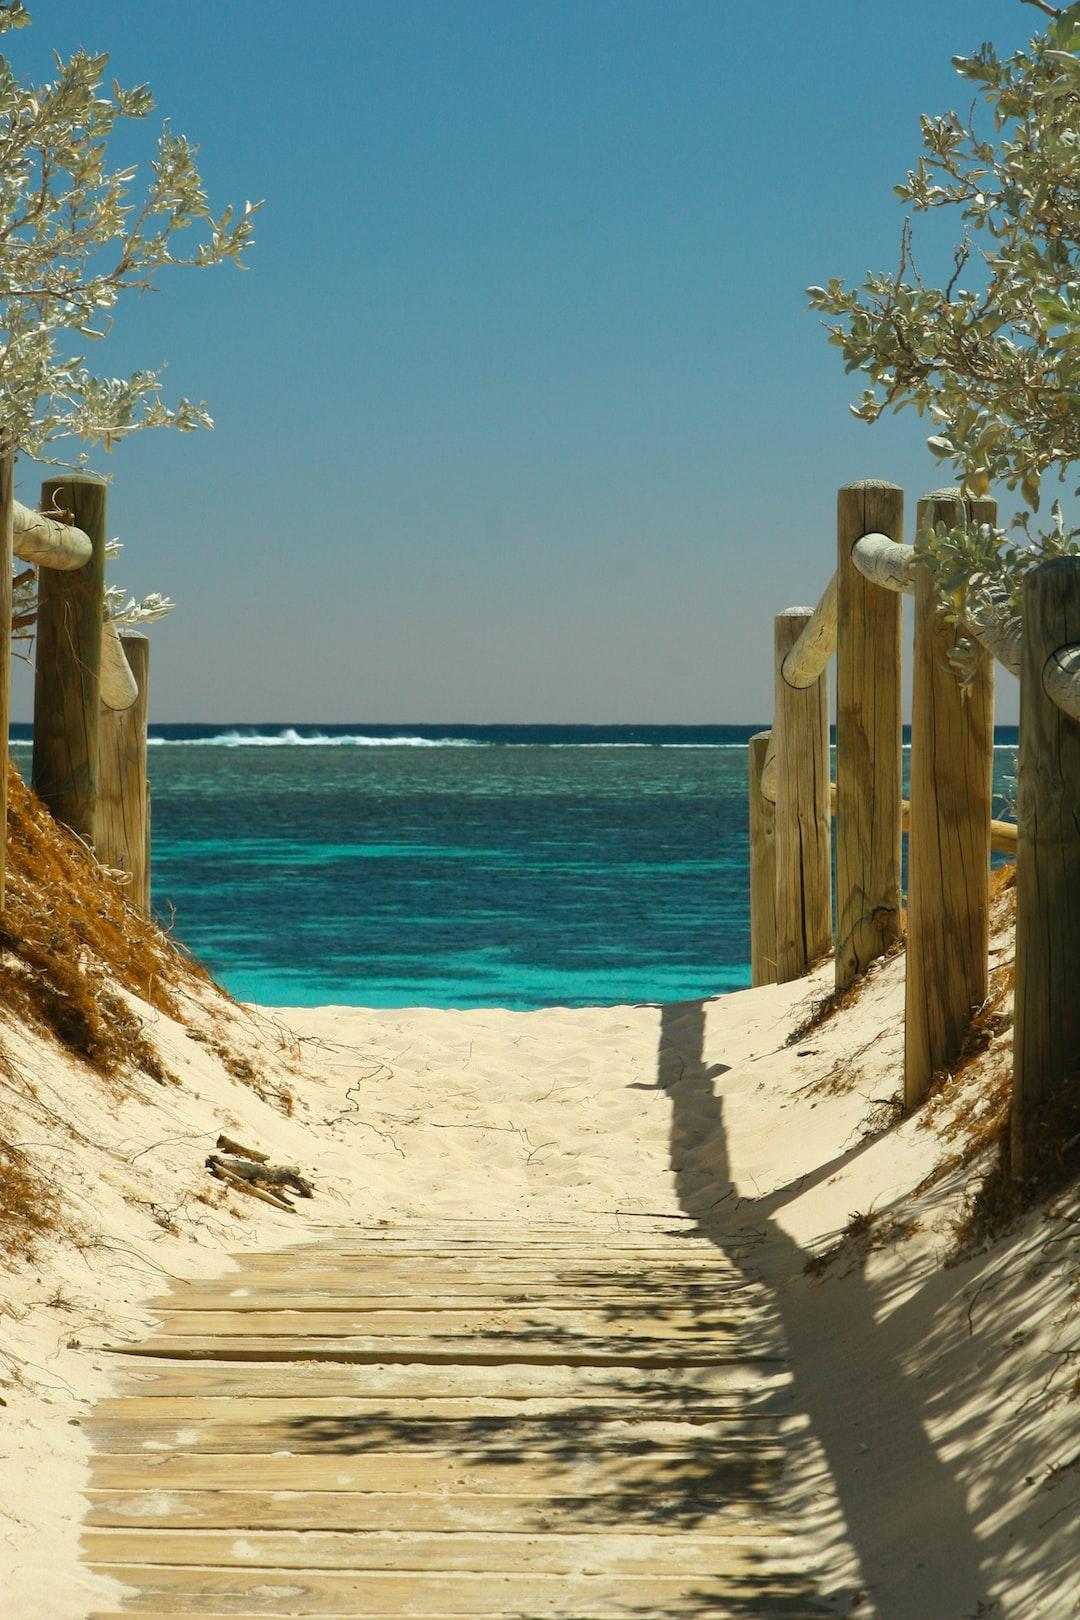 Summer Pictures Download Free Images On Unsplash